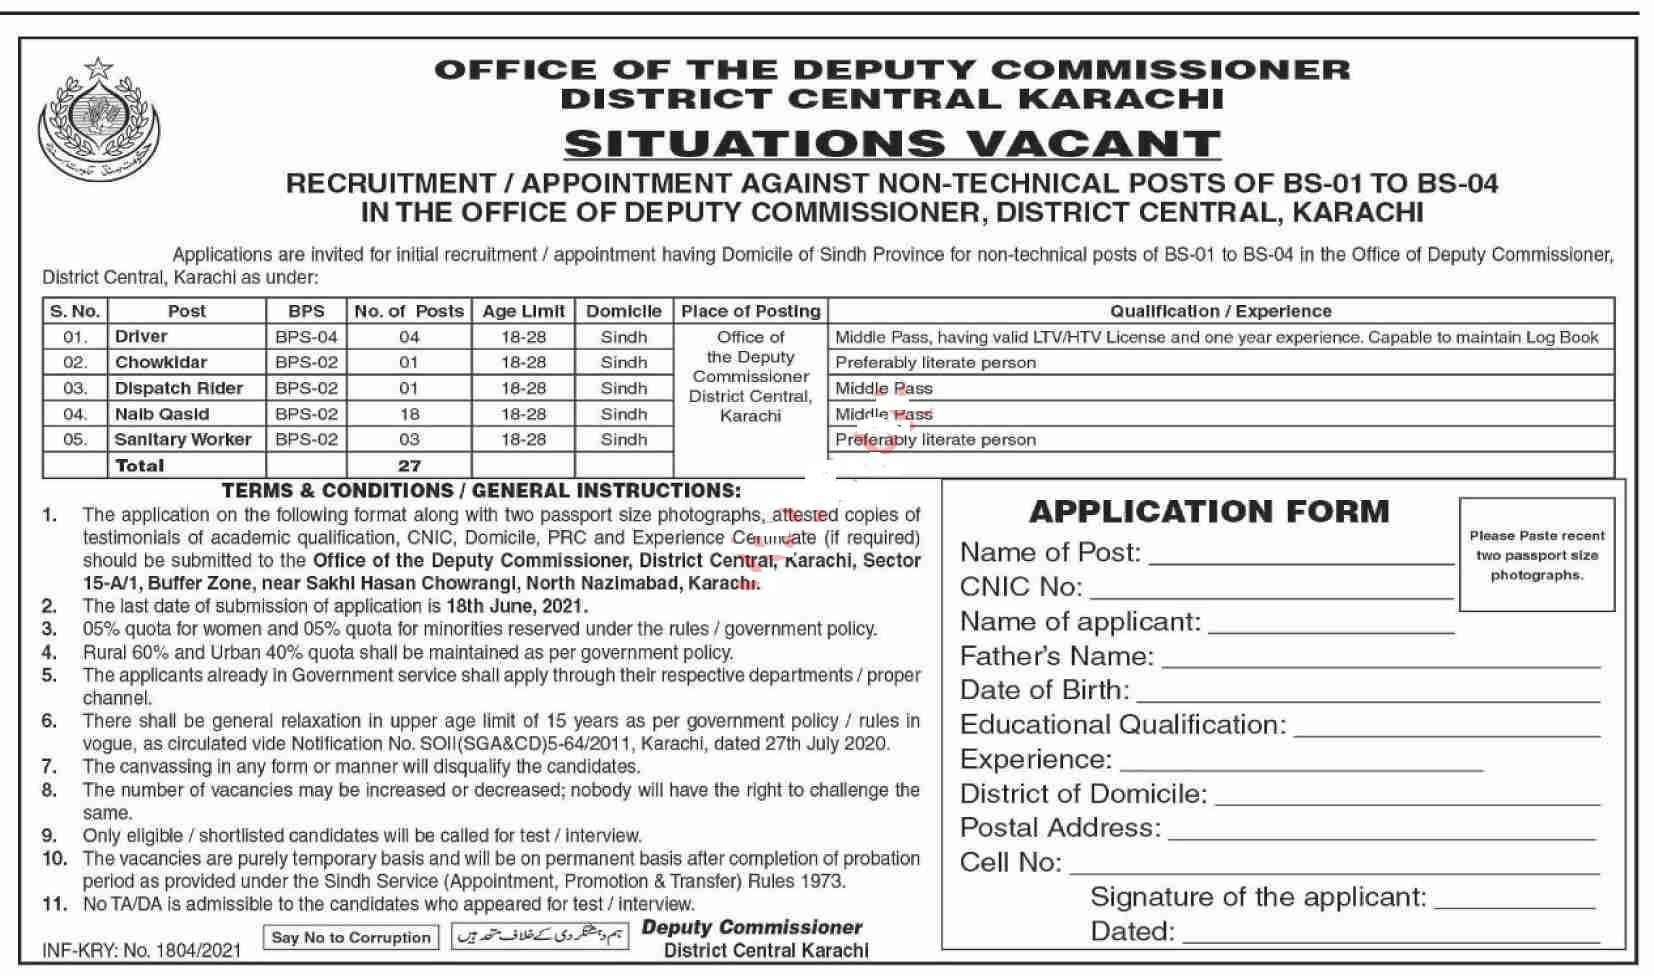 Deputy Commissioner DC Central Karachi Jobs 2021